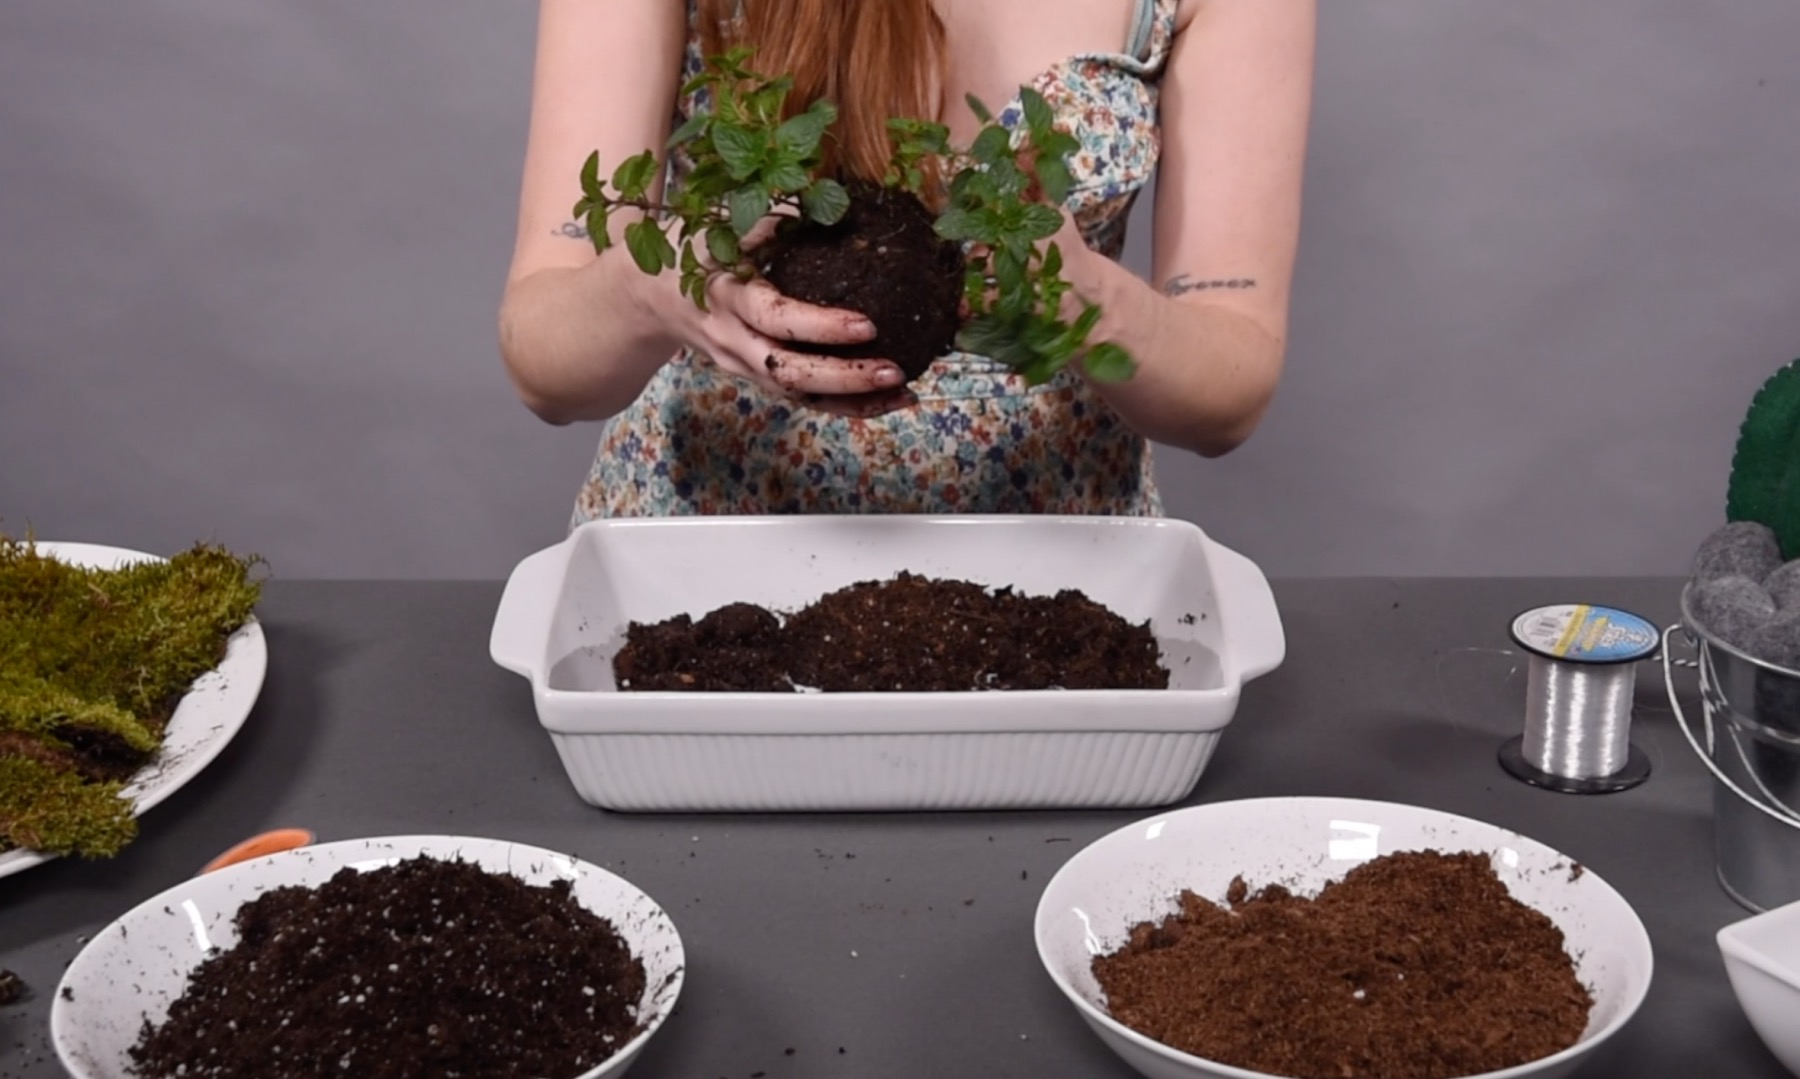 kokedama plant inside the mud ball ready for moss